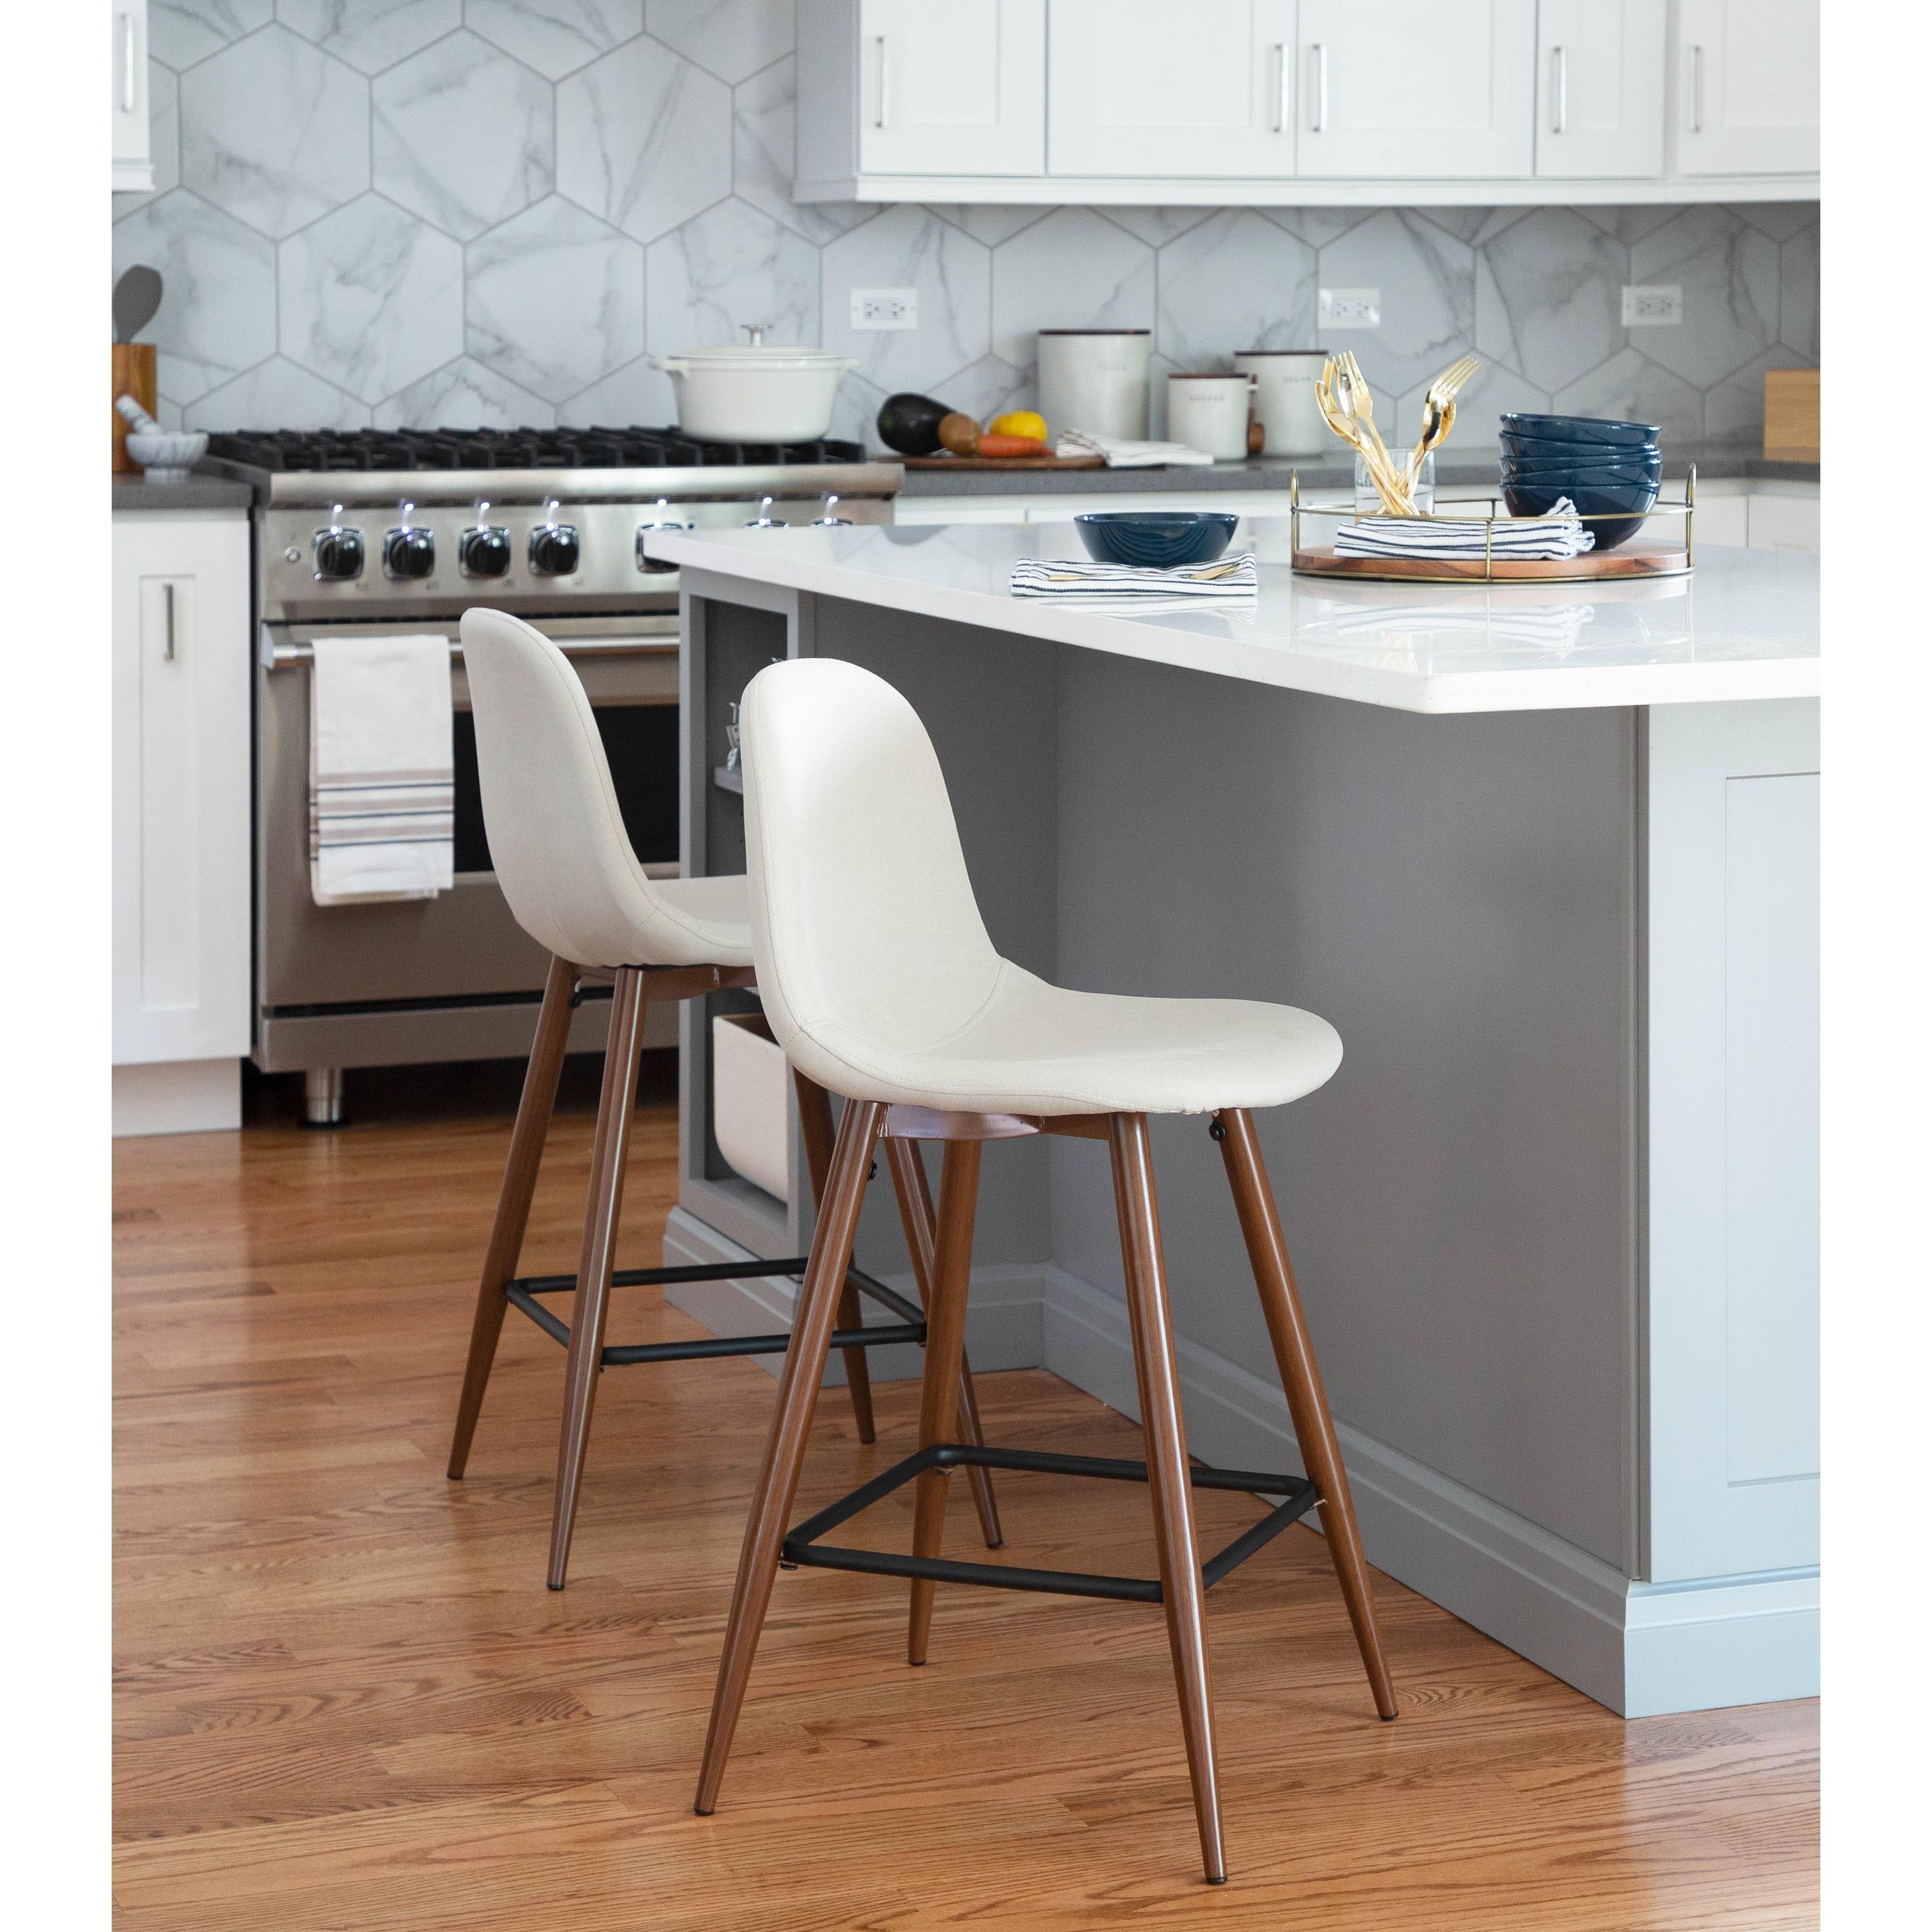 Pebble Mid Century Modern Upholstered Kitchen Counter Stool Set of 9